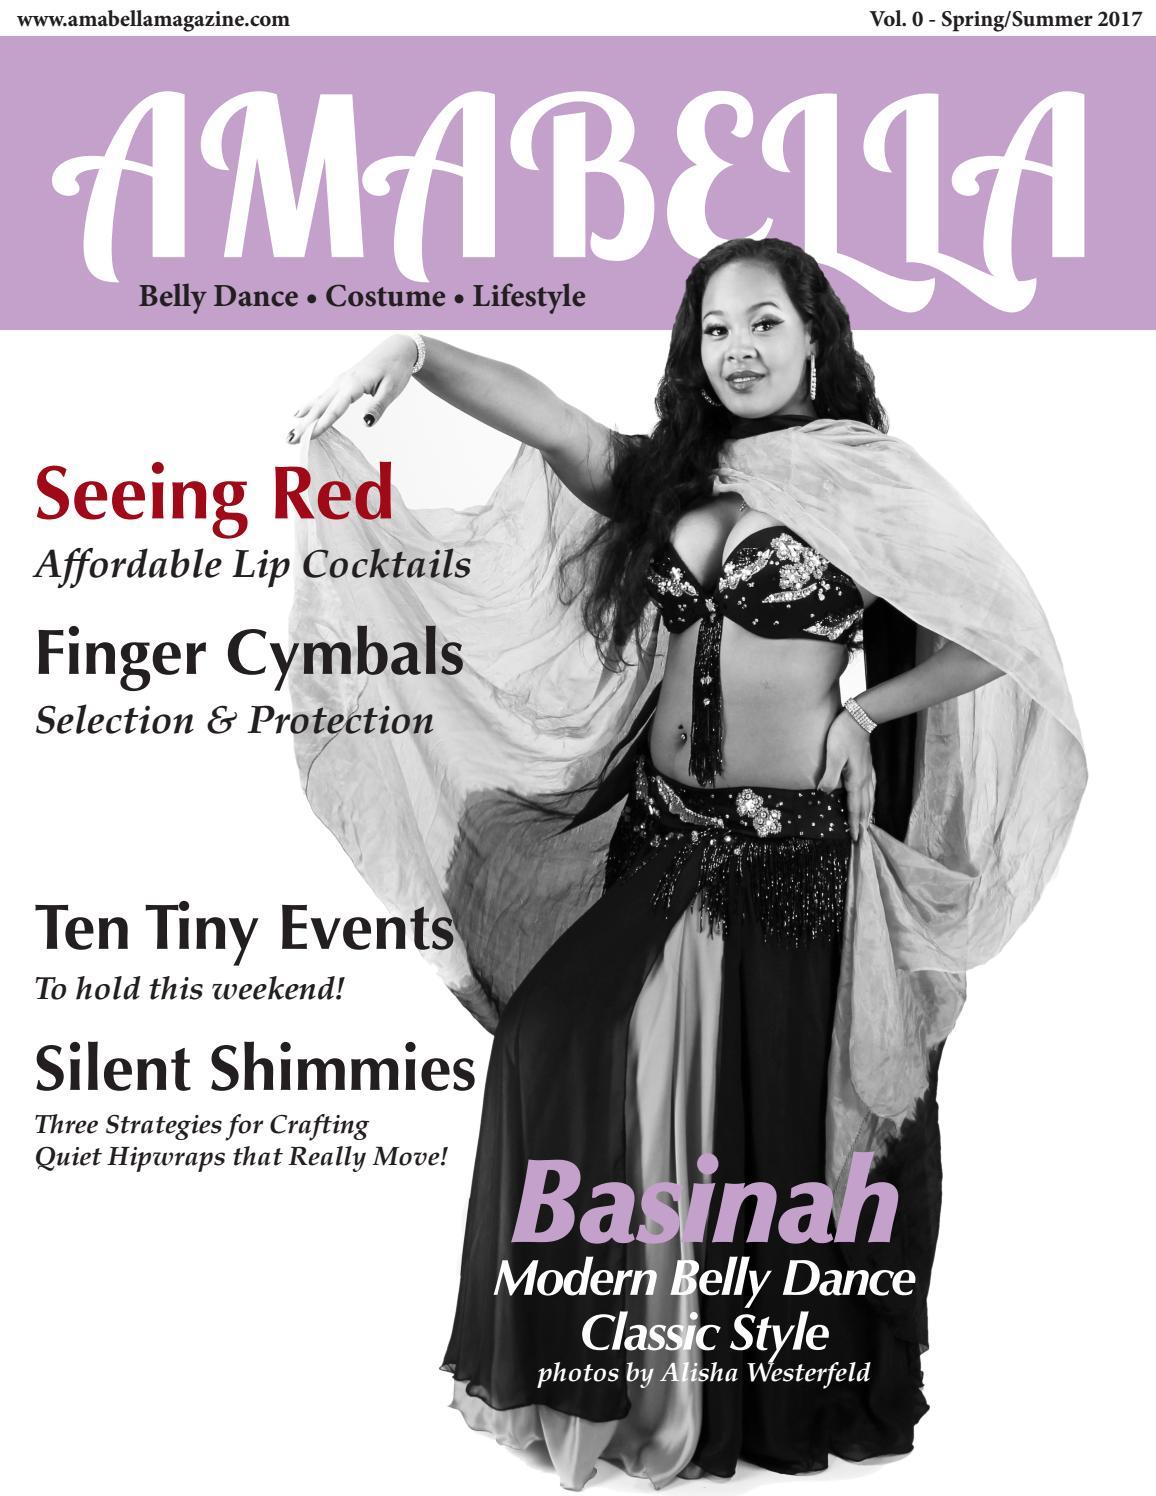 Amabella Magazine V0, Summer 2017 by Ibexa Press - Issuu